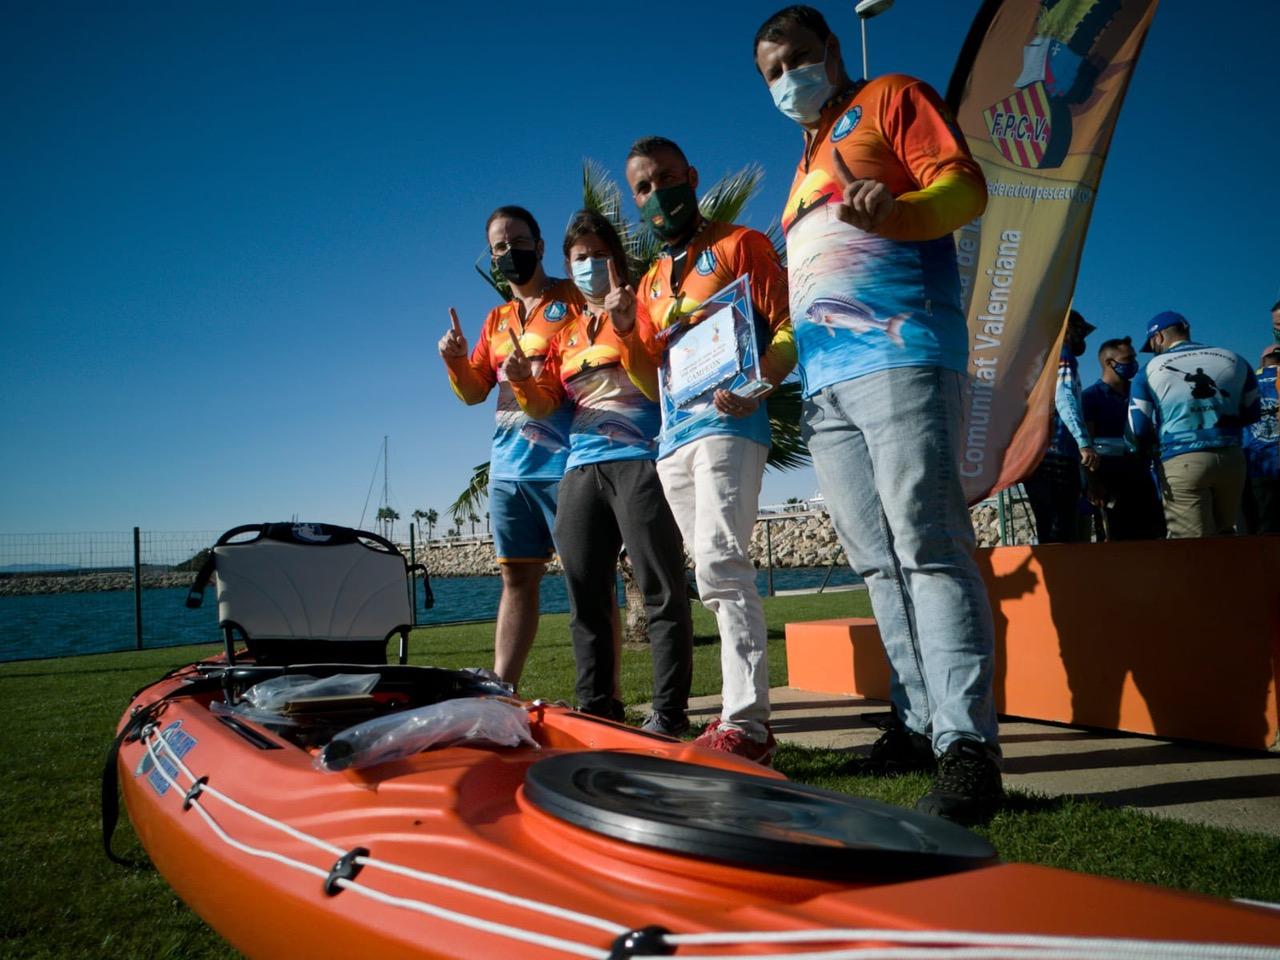 El Club de Pesca en Kayak de Marina El Portet de Dénia JOaquin Molpeceres Francisco José Piñero